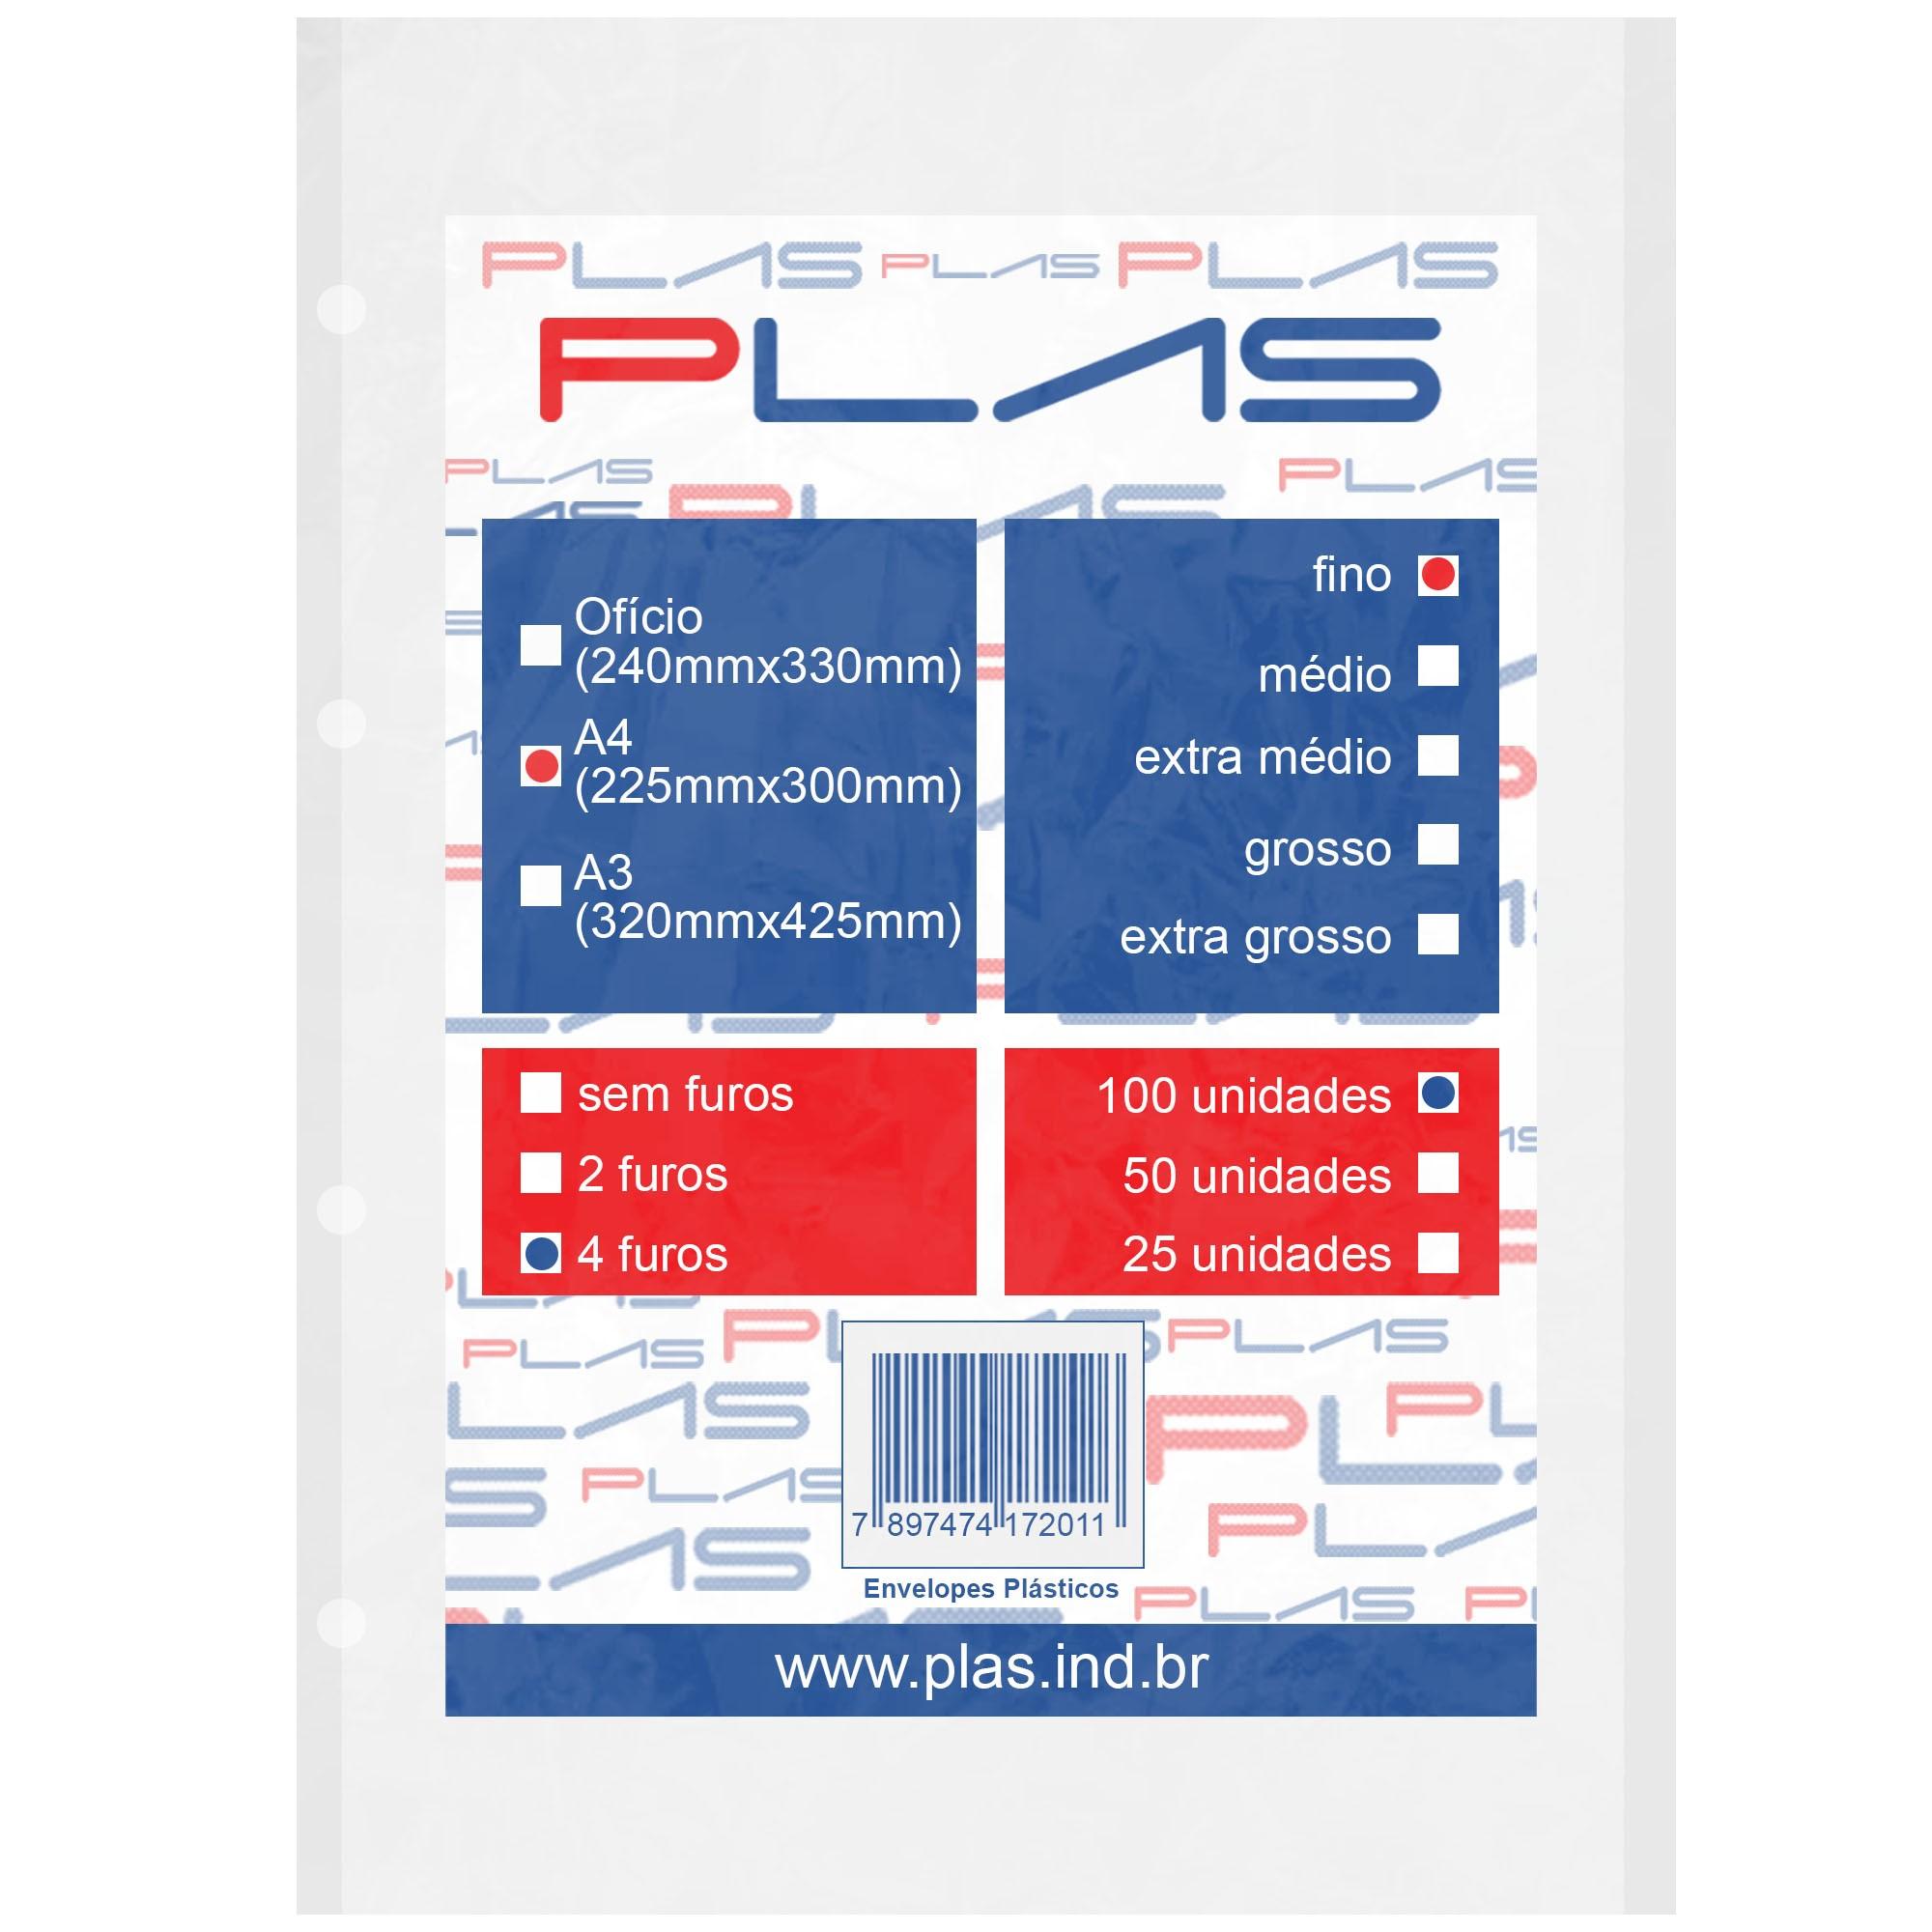 Envelope Saco Plastico tamanho A4 4 furos Fino pct c/ 100 un - Iplas